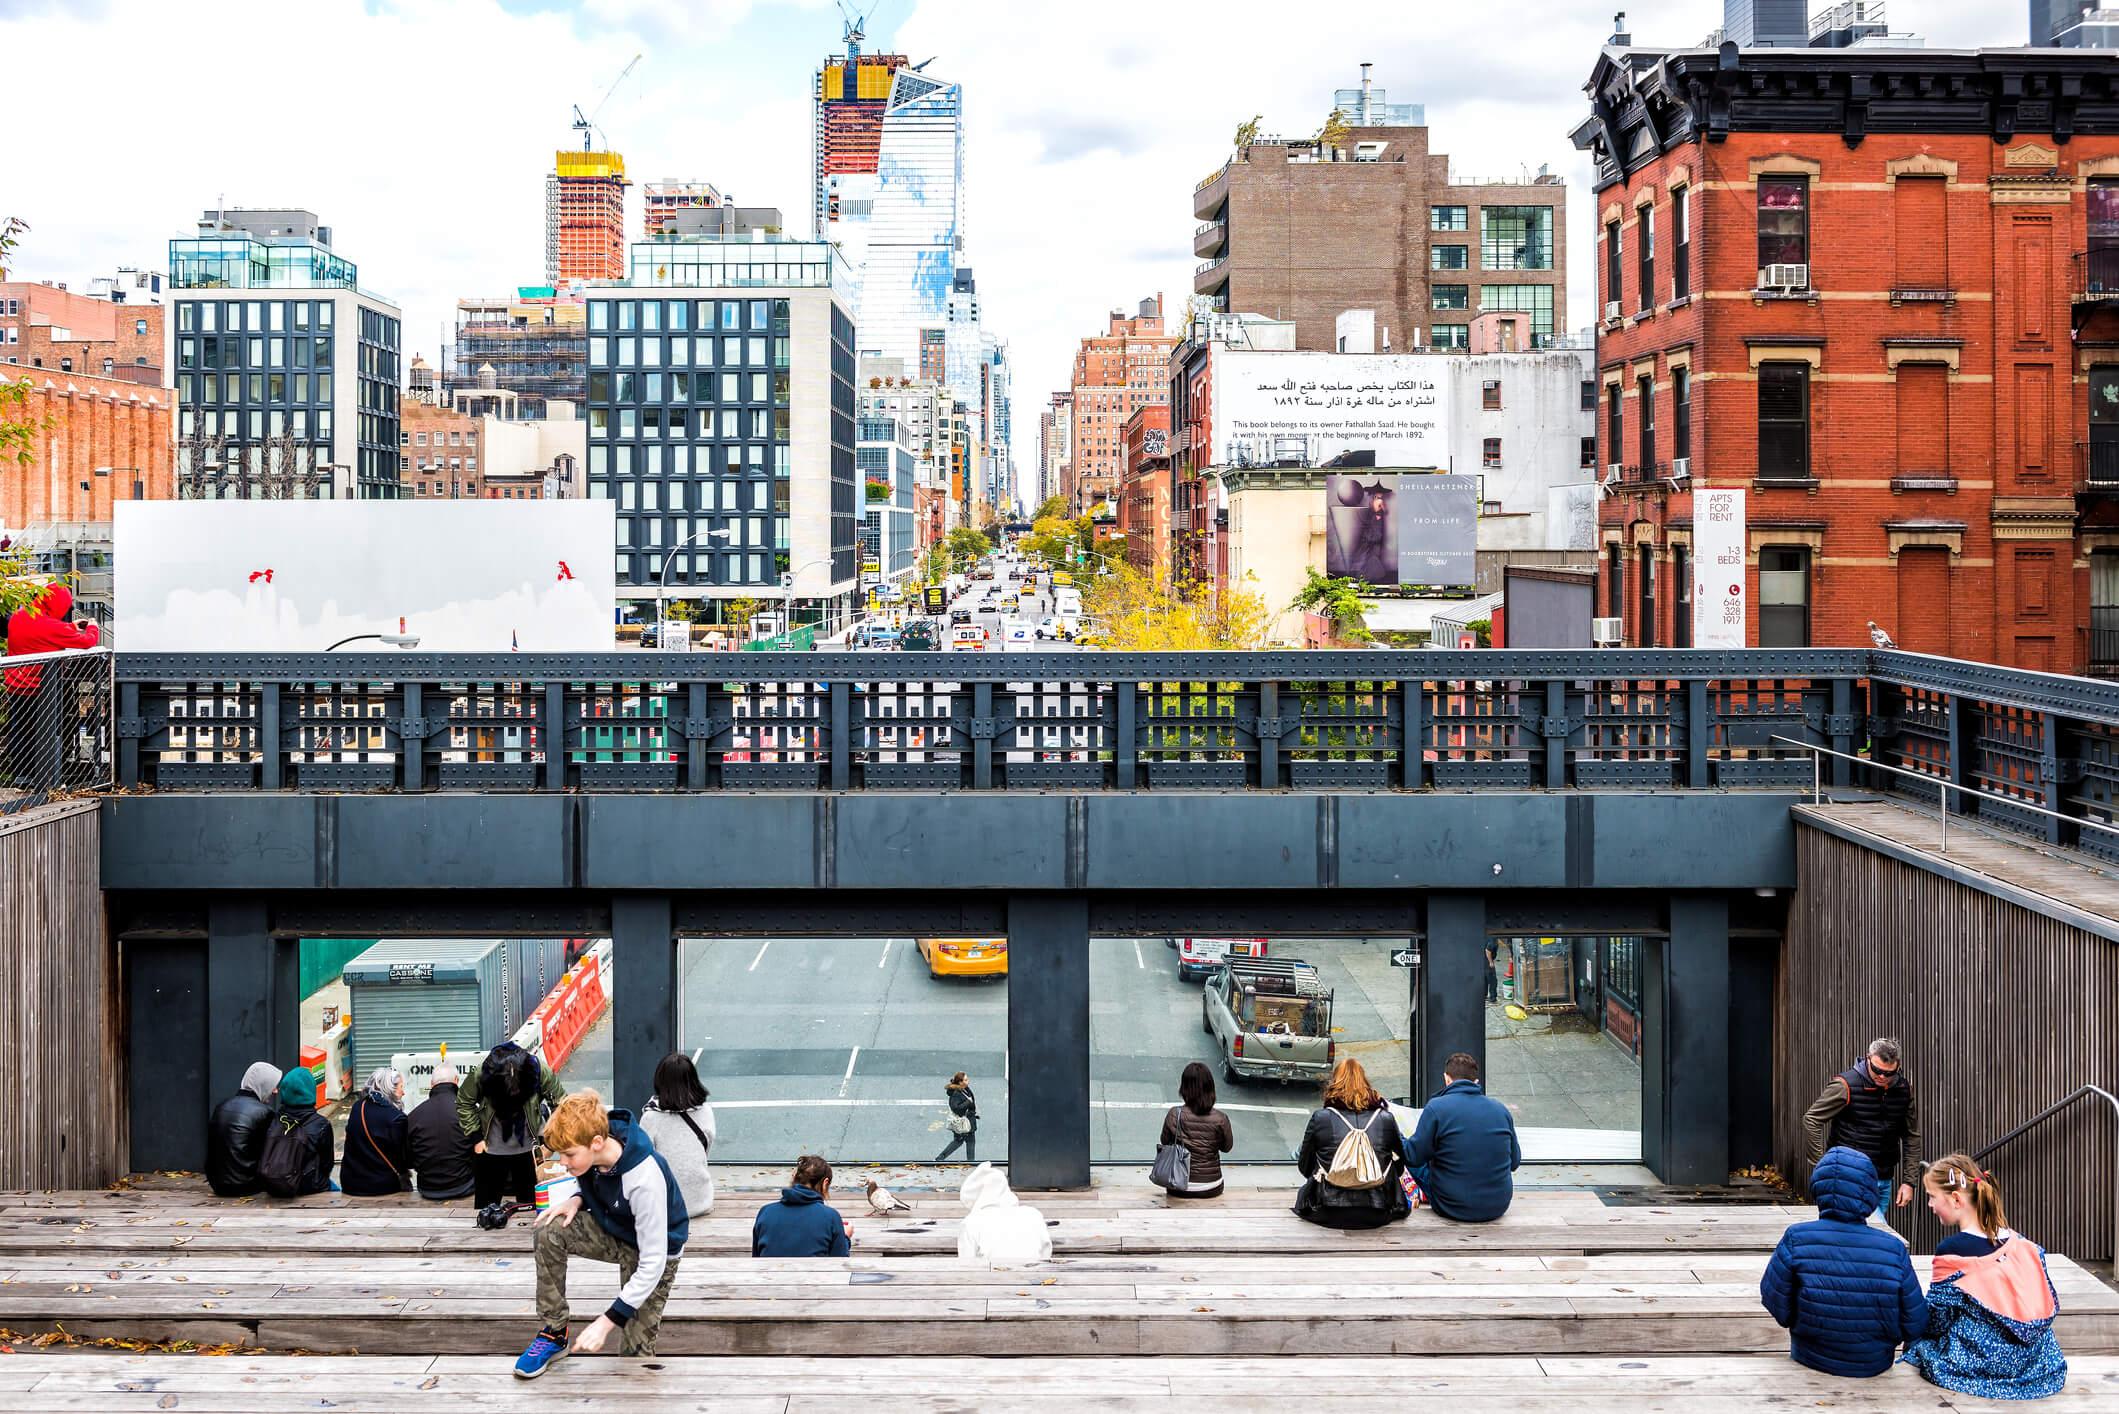 Traumziel New York City